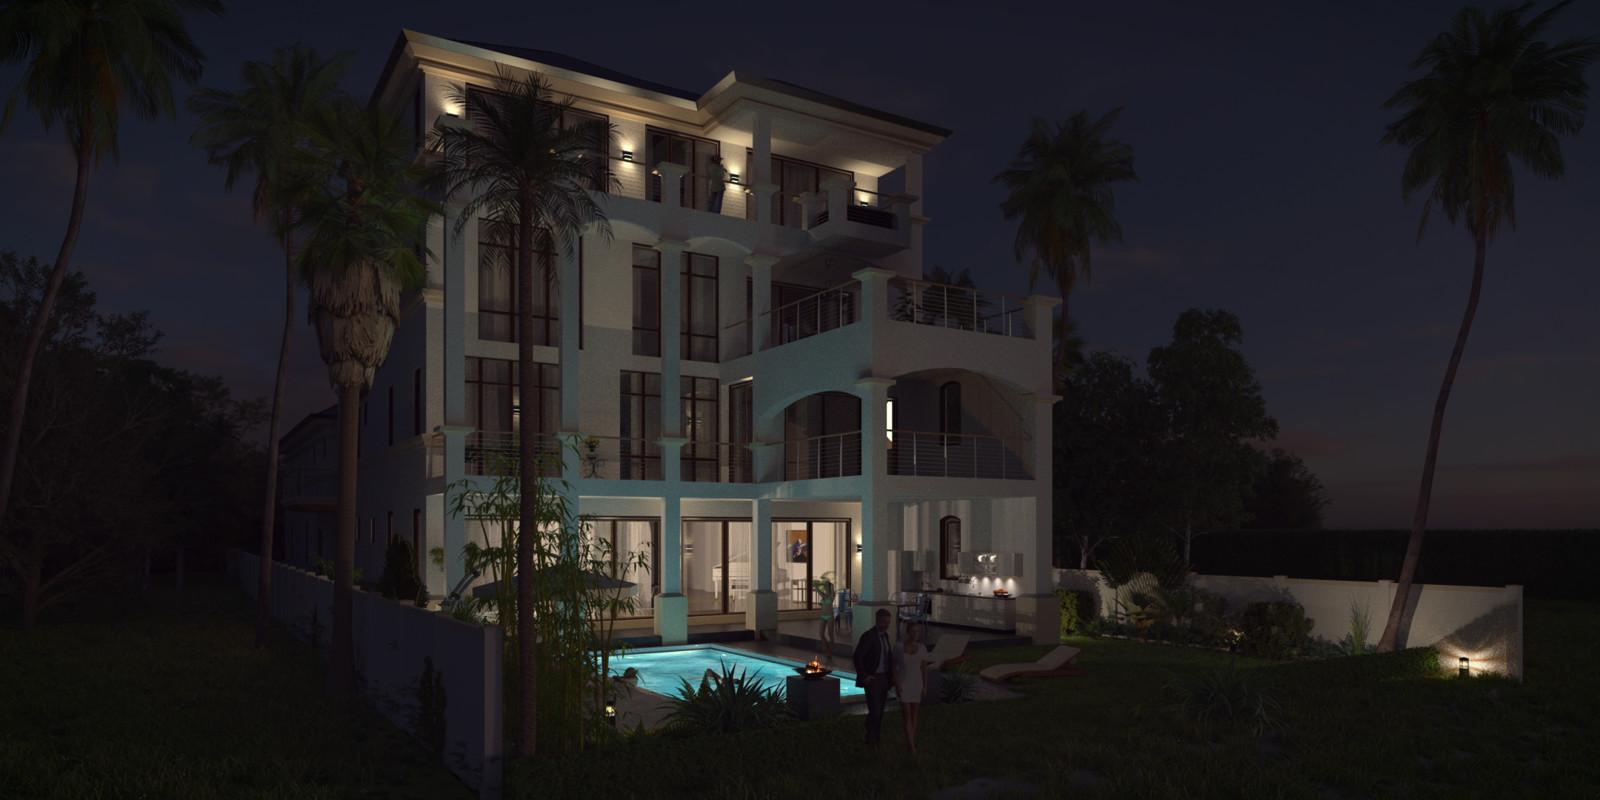 SketchUp + Thea Render  Seagrove Beach House: Scene 69 Night D Lumina 2160 × 1080 Presto MC Bucket